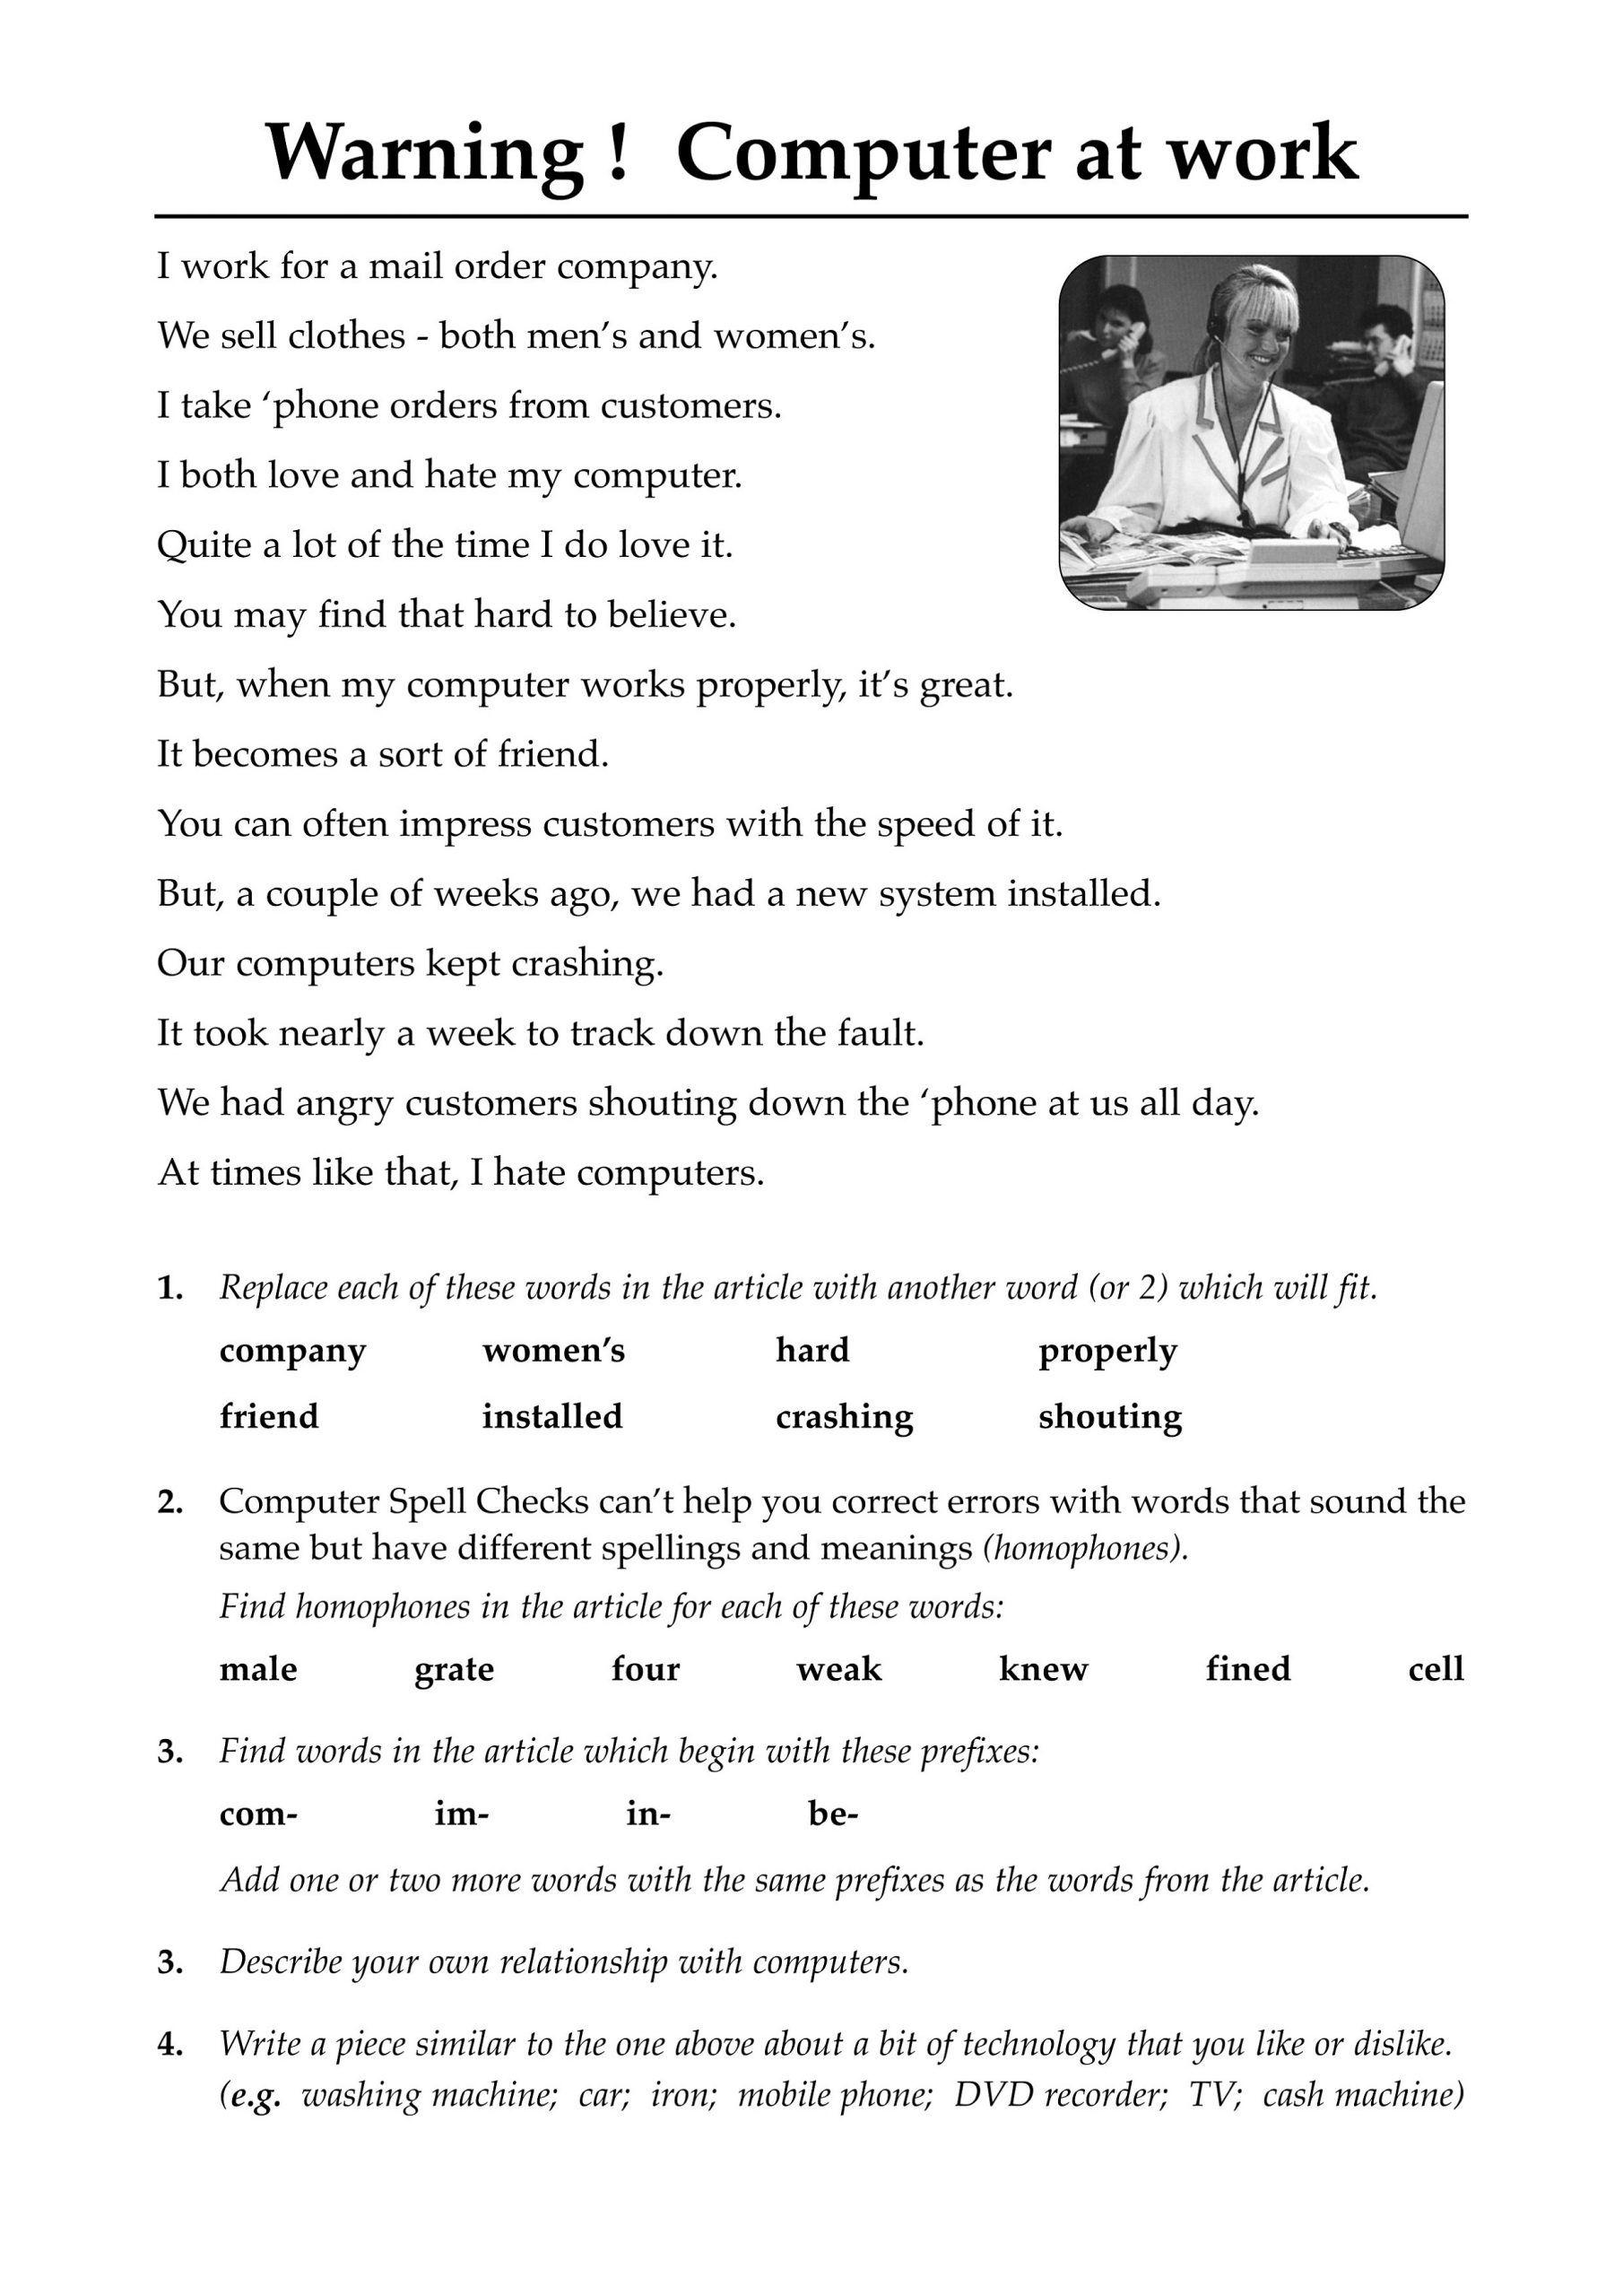 Literacy Worksheets For Reading Development Literacy Worksheets Free Reading Comprehension Worksheets Reading Comprehension Skills